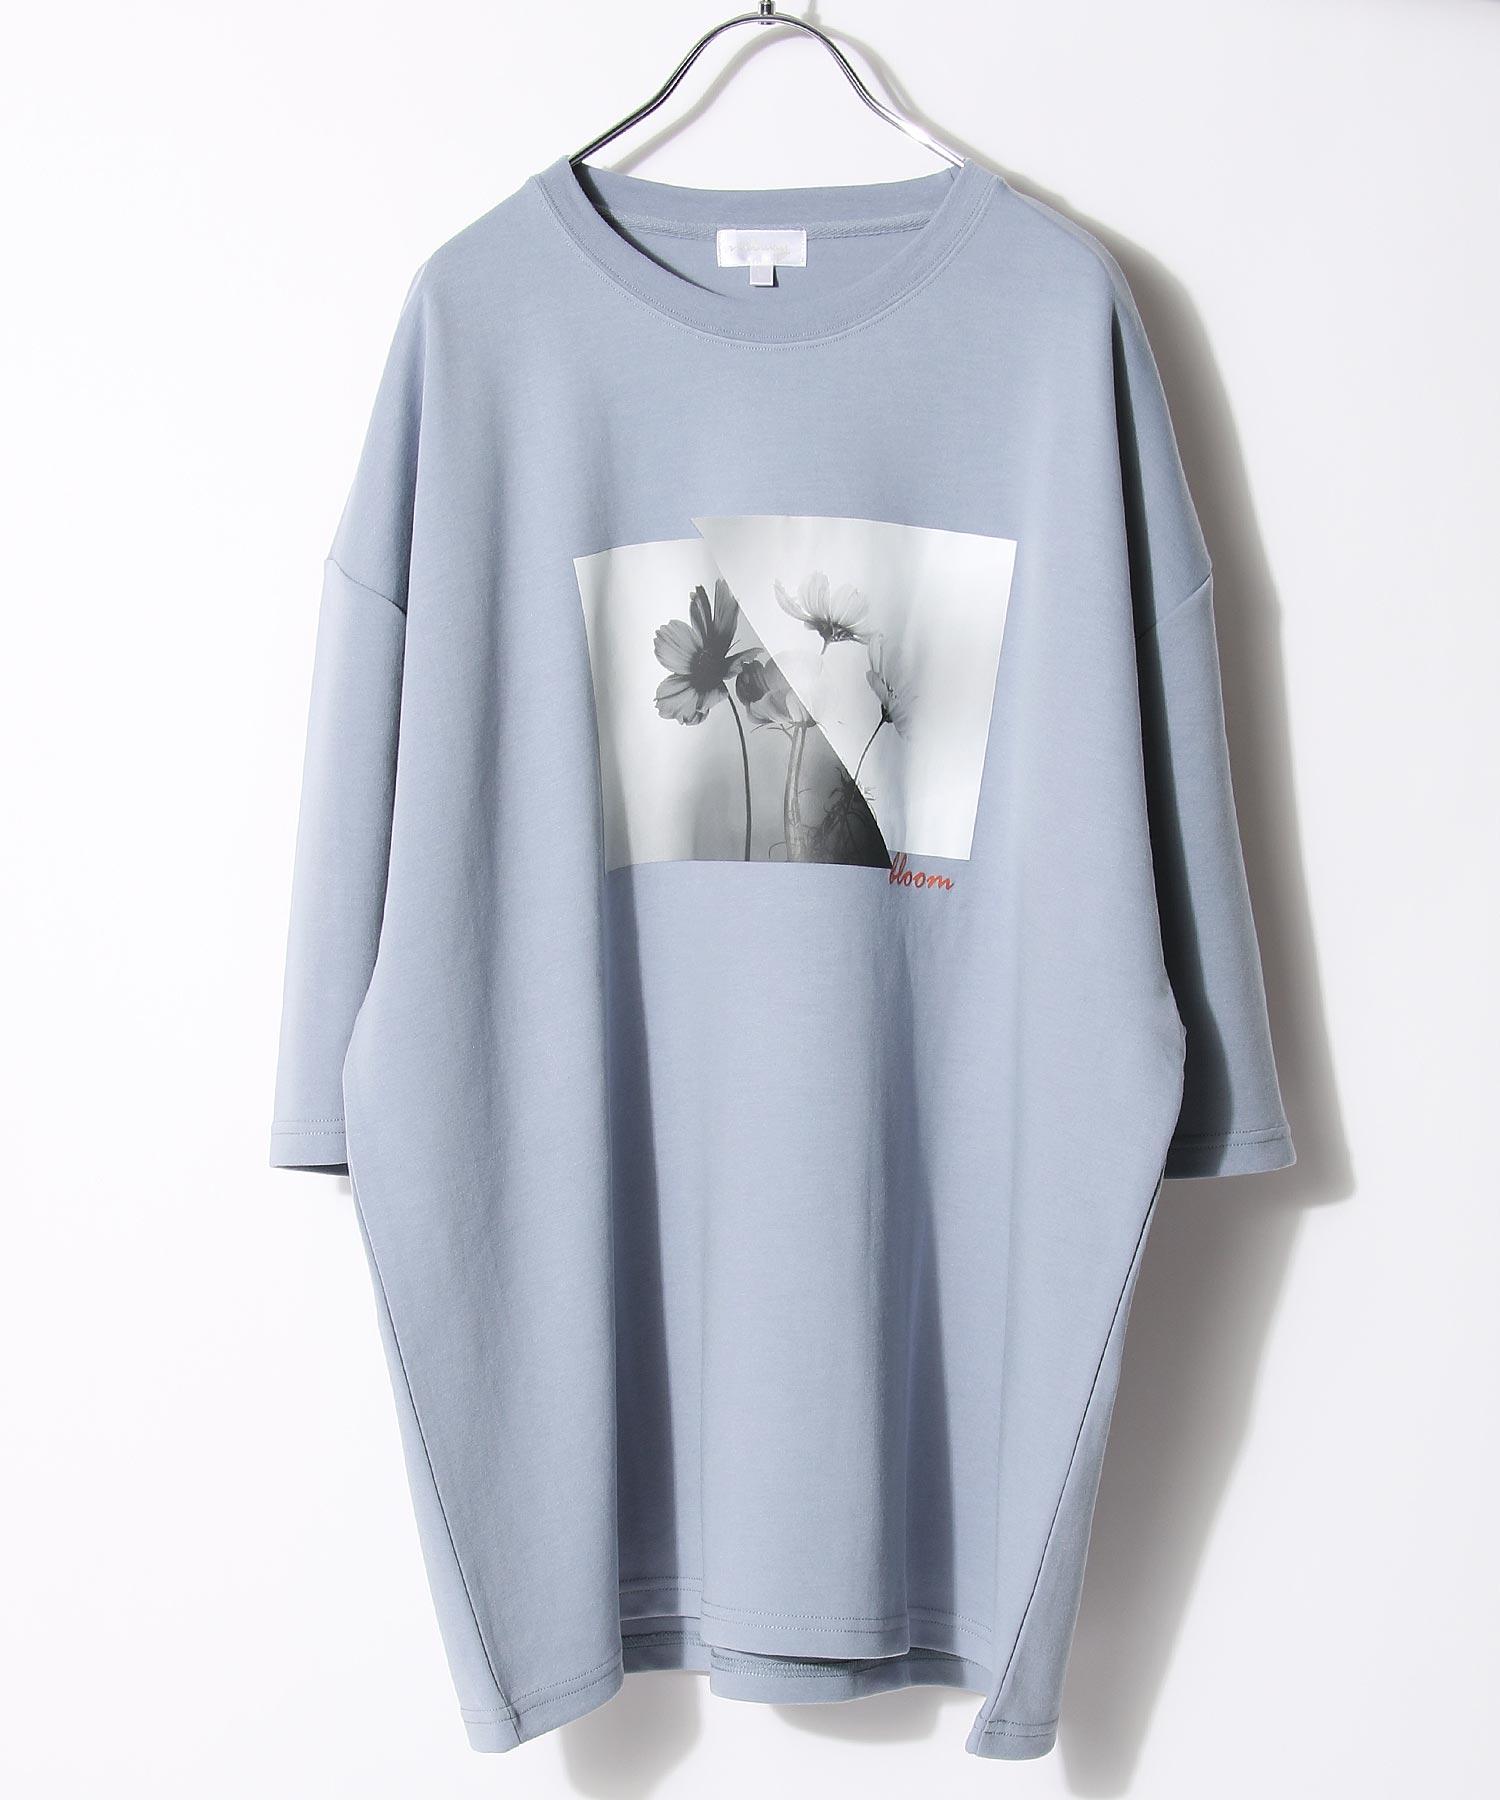 【Nilway】黑白花藝術照T恤 日系 寬版 1